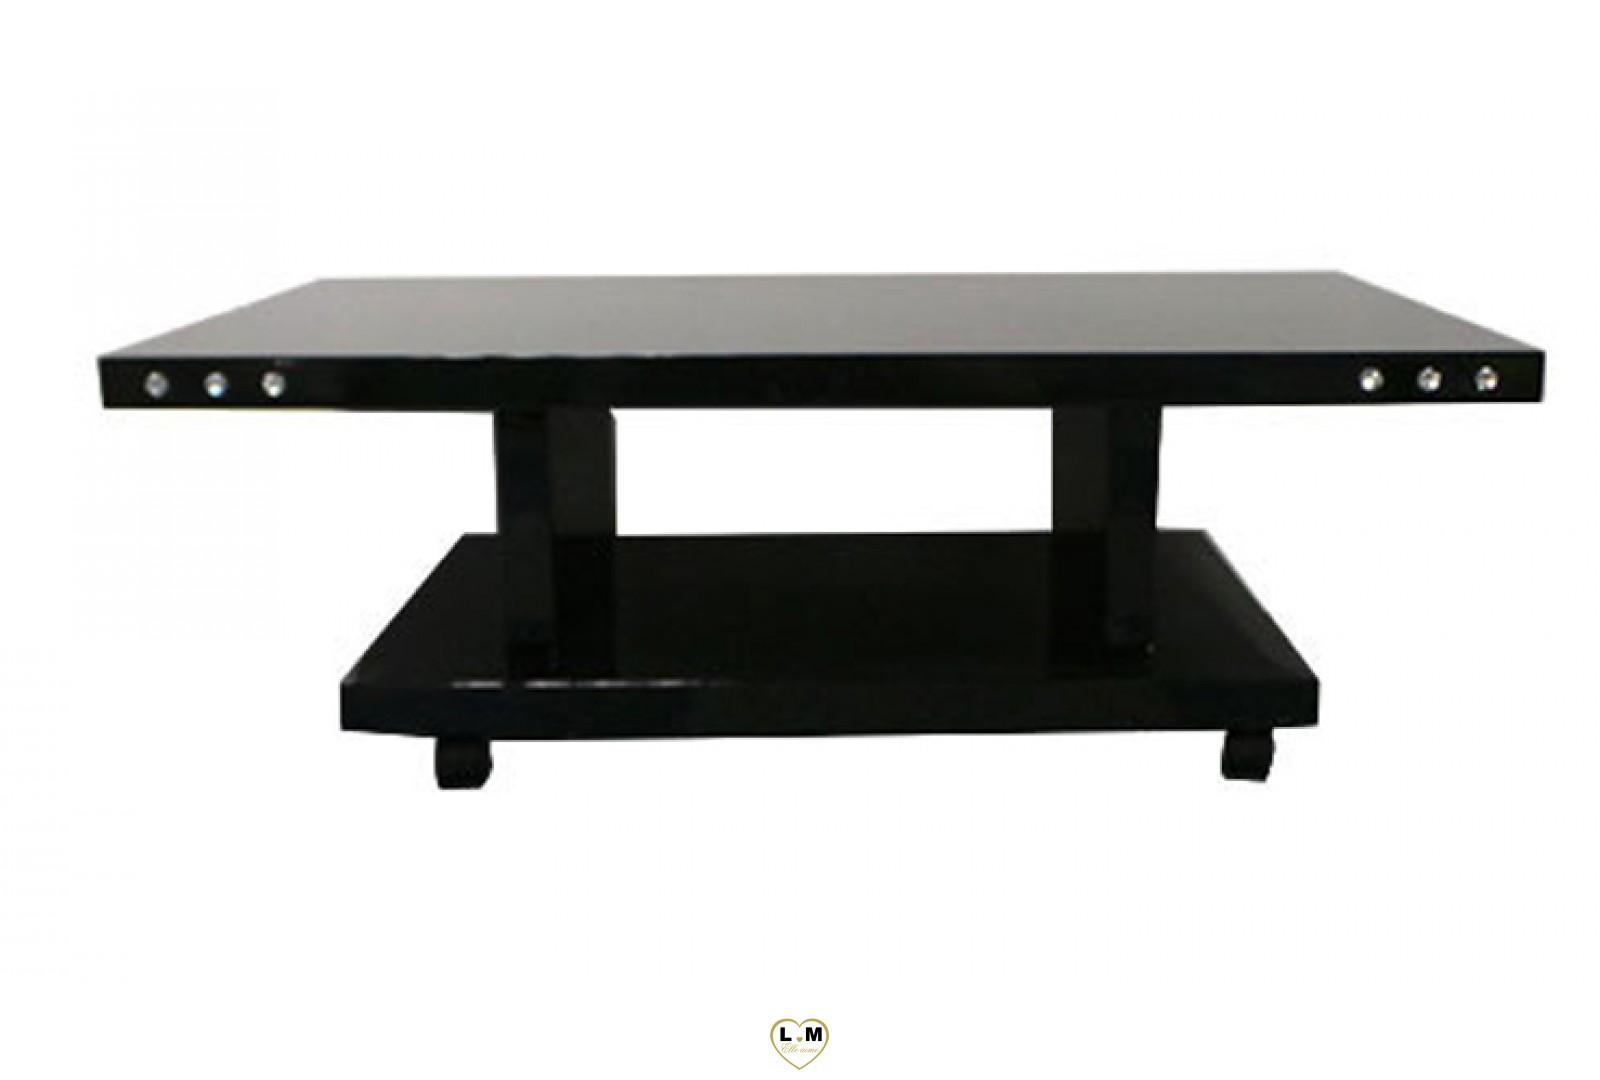 tba02n table basse laque noir lignemeuble com. Black Bedroom Furniture Sets. Home Design Ideas